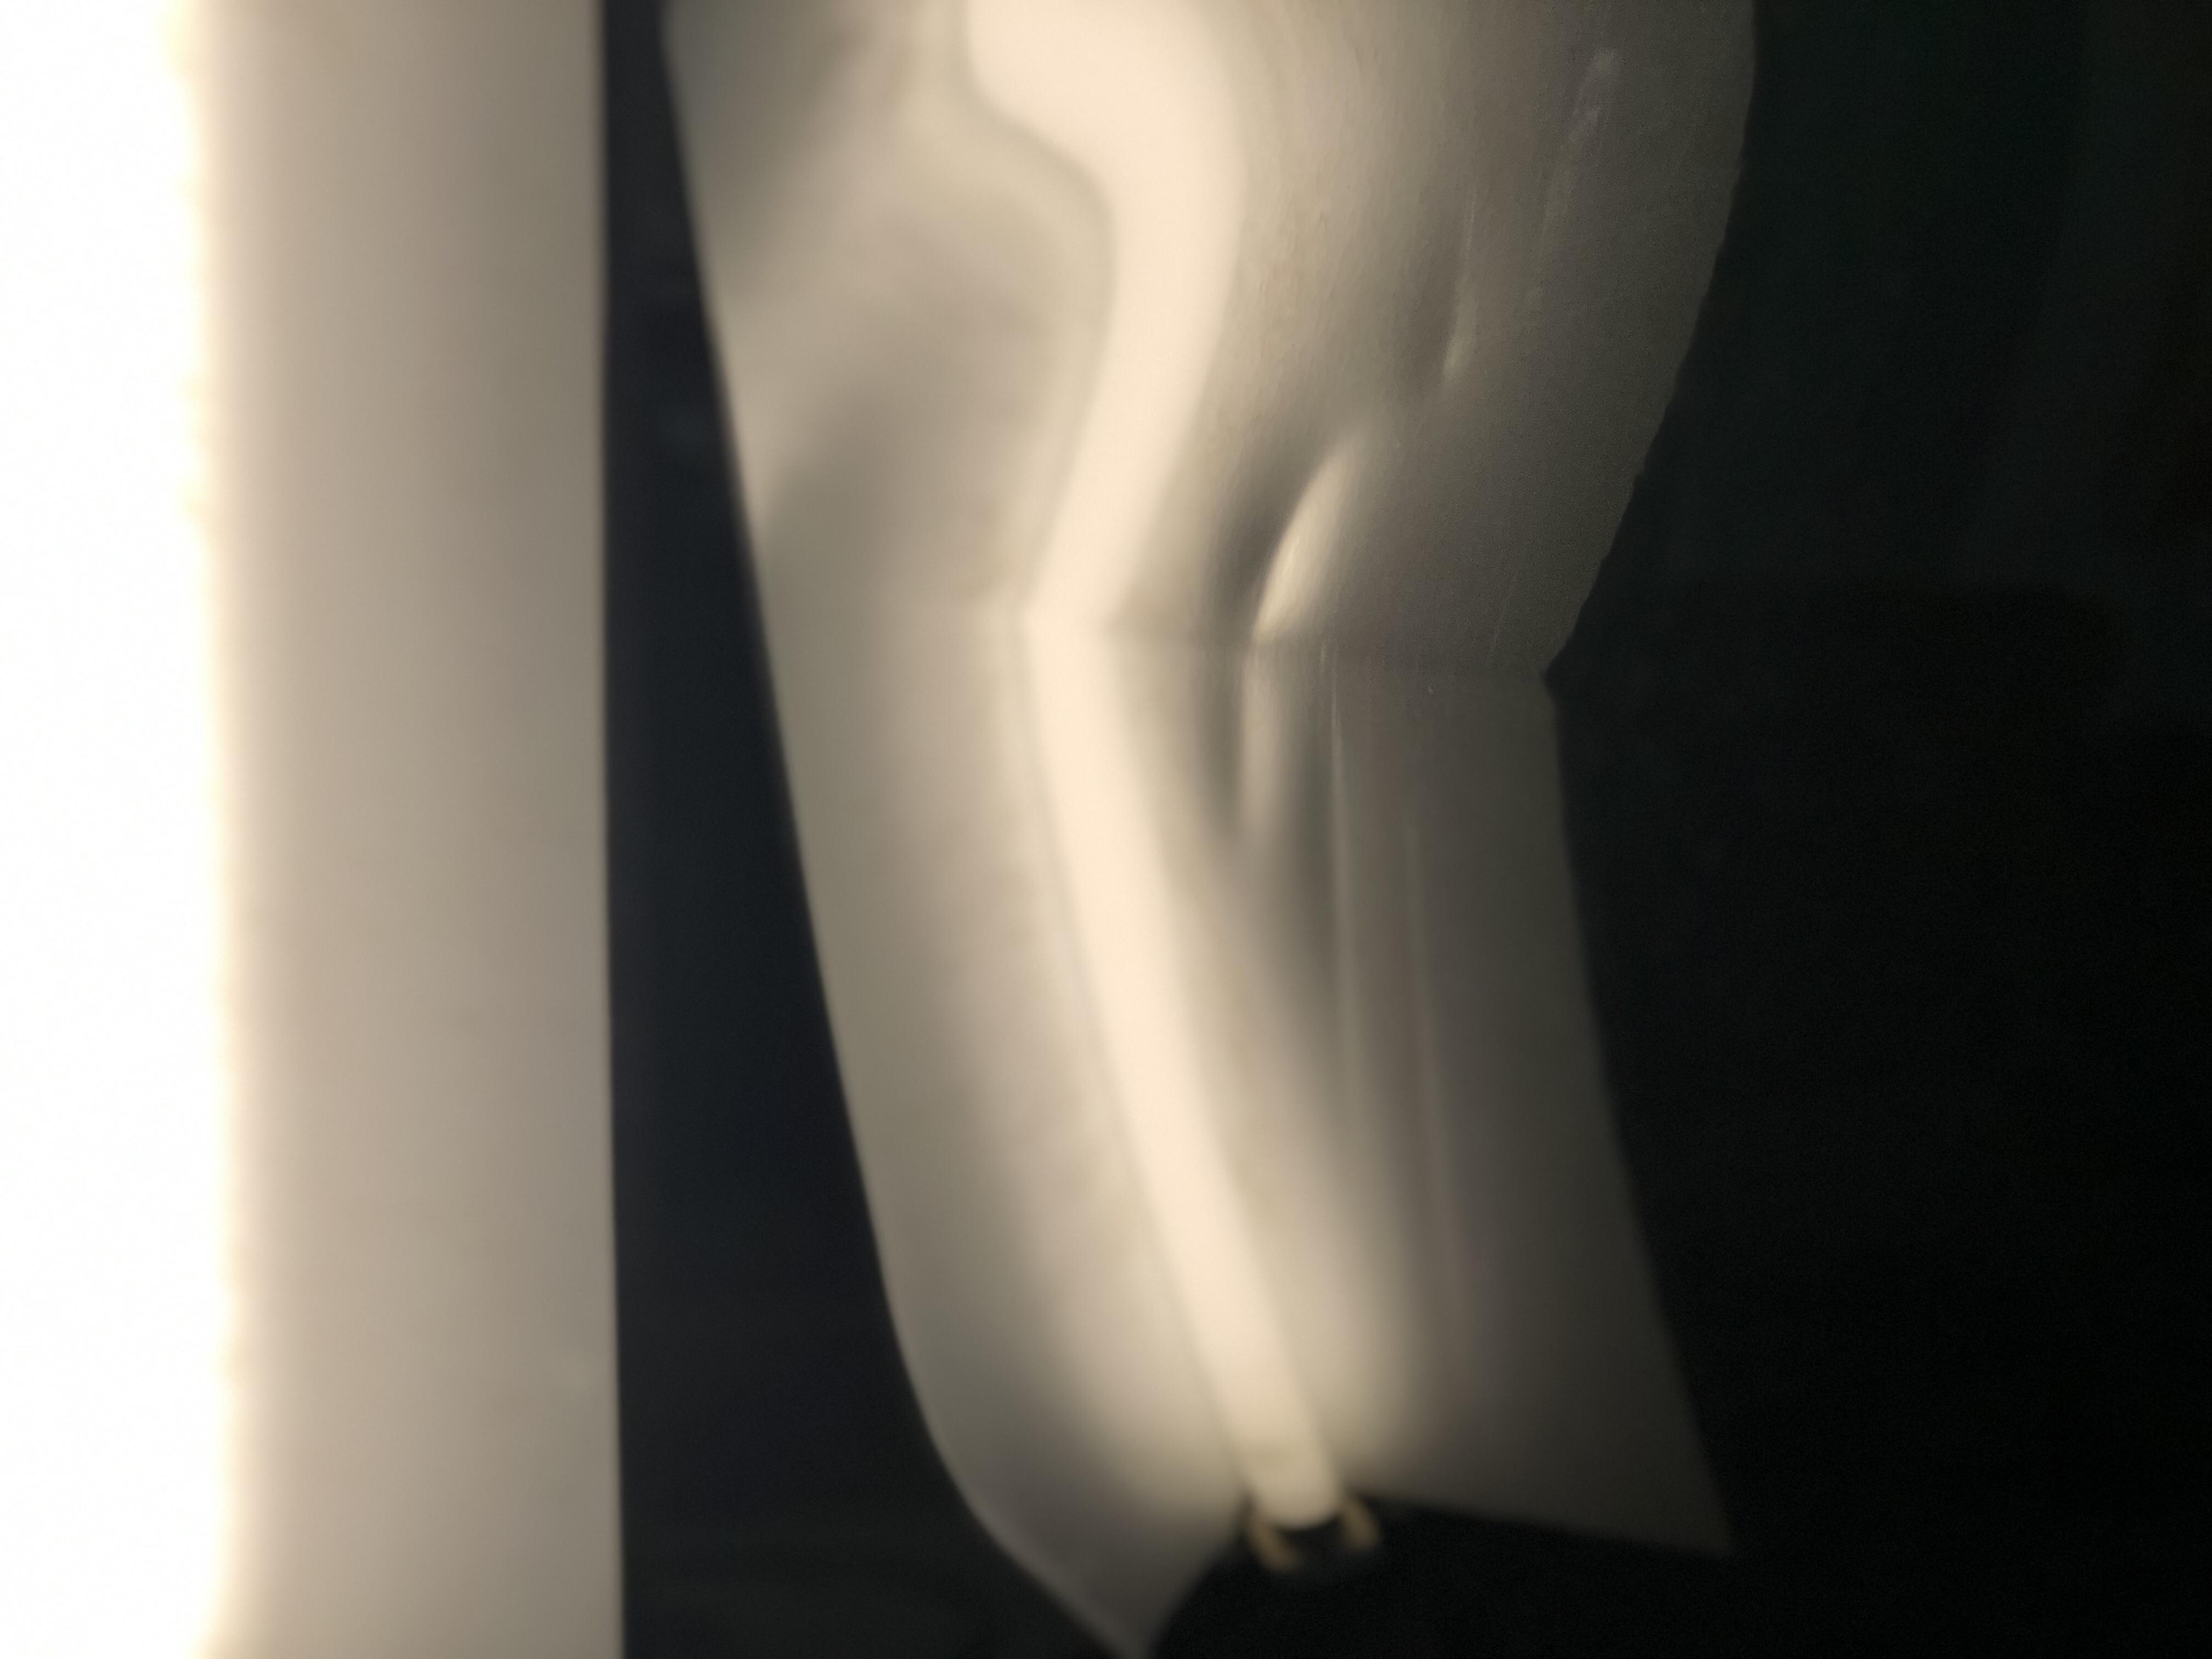 N-BOX スライドドアのデントリペア